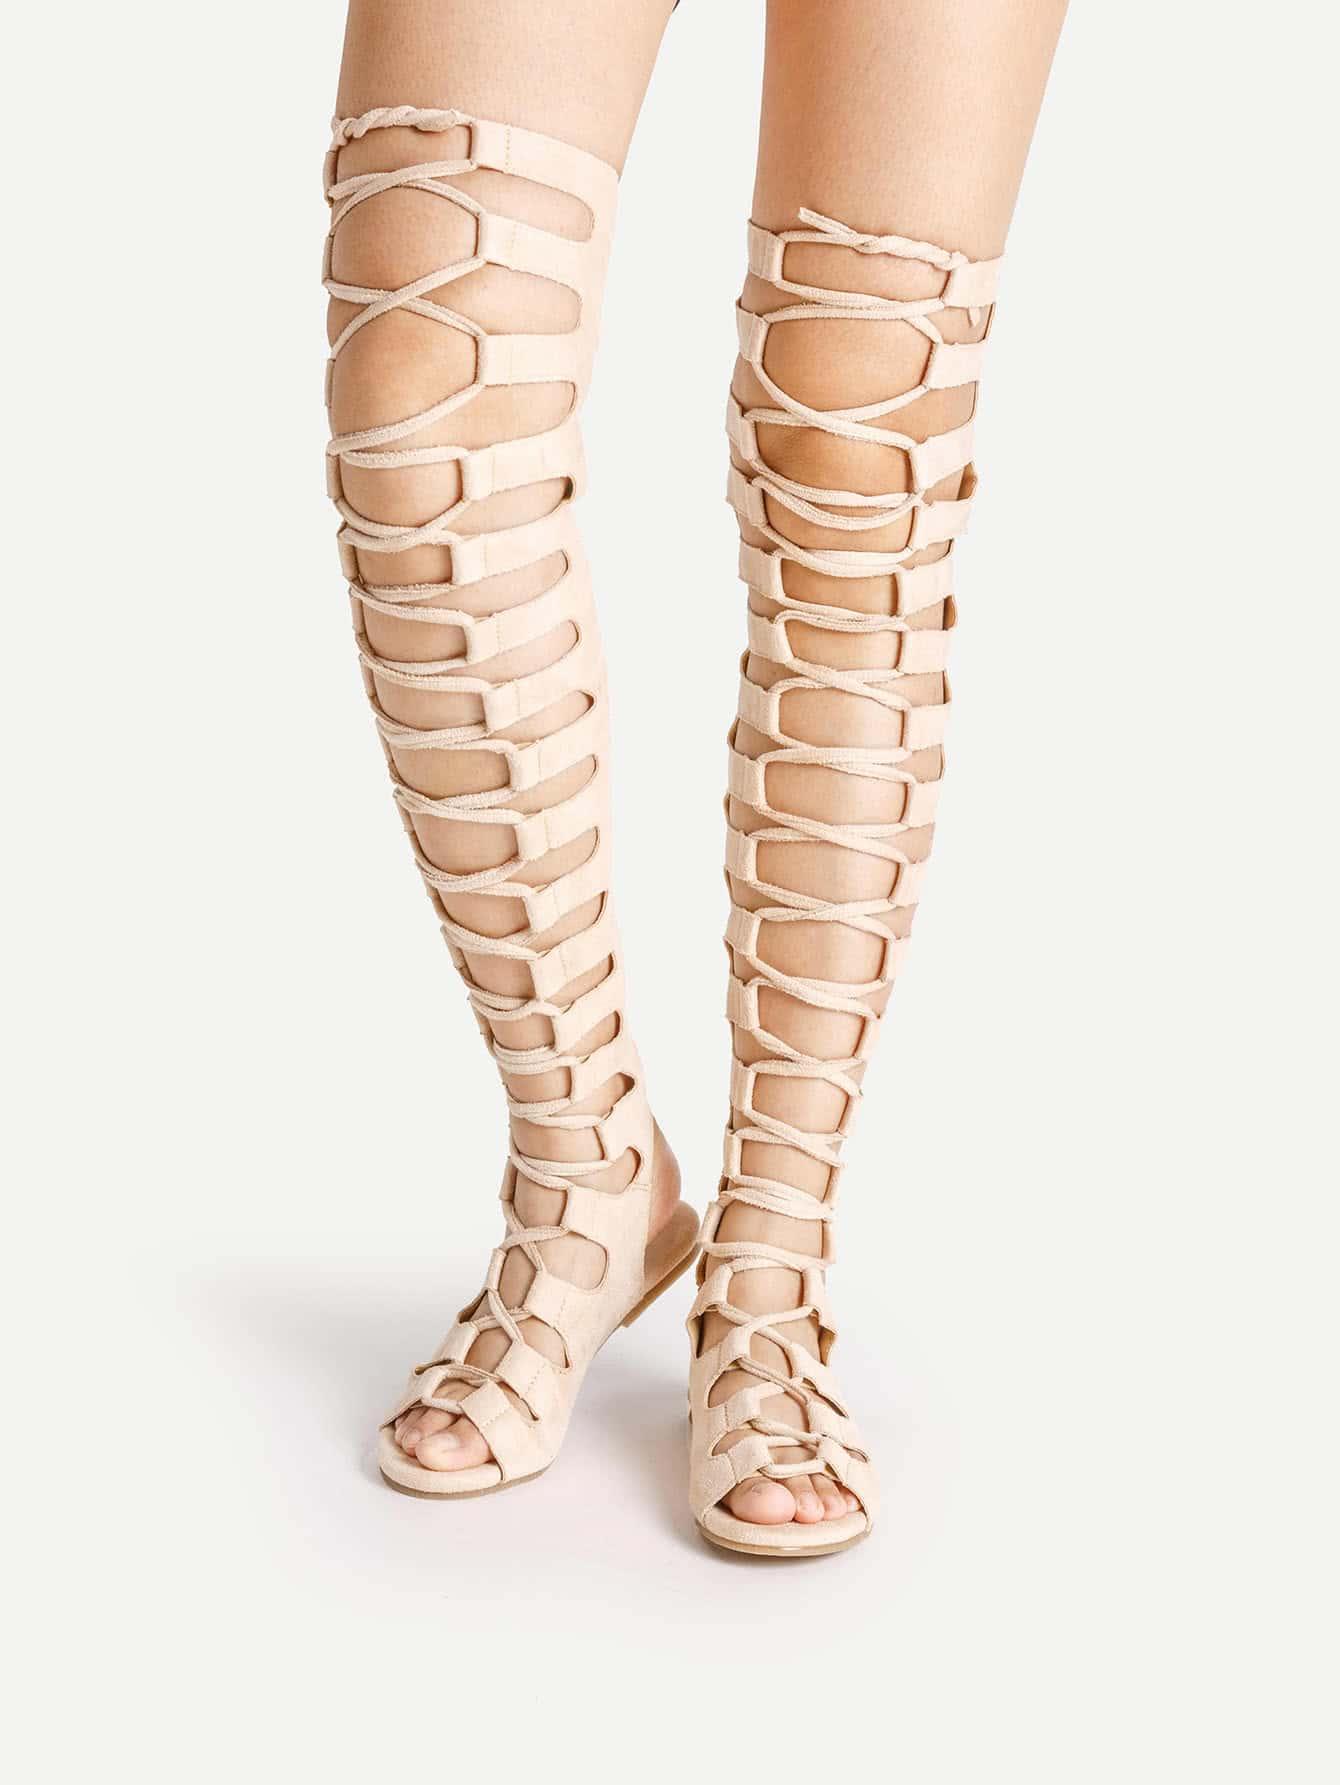 Ladder Cutout Zipper Back Gladiator Sandals mmcsandal-jovena1-beige